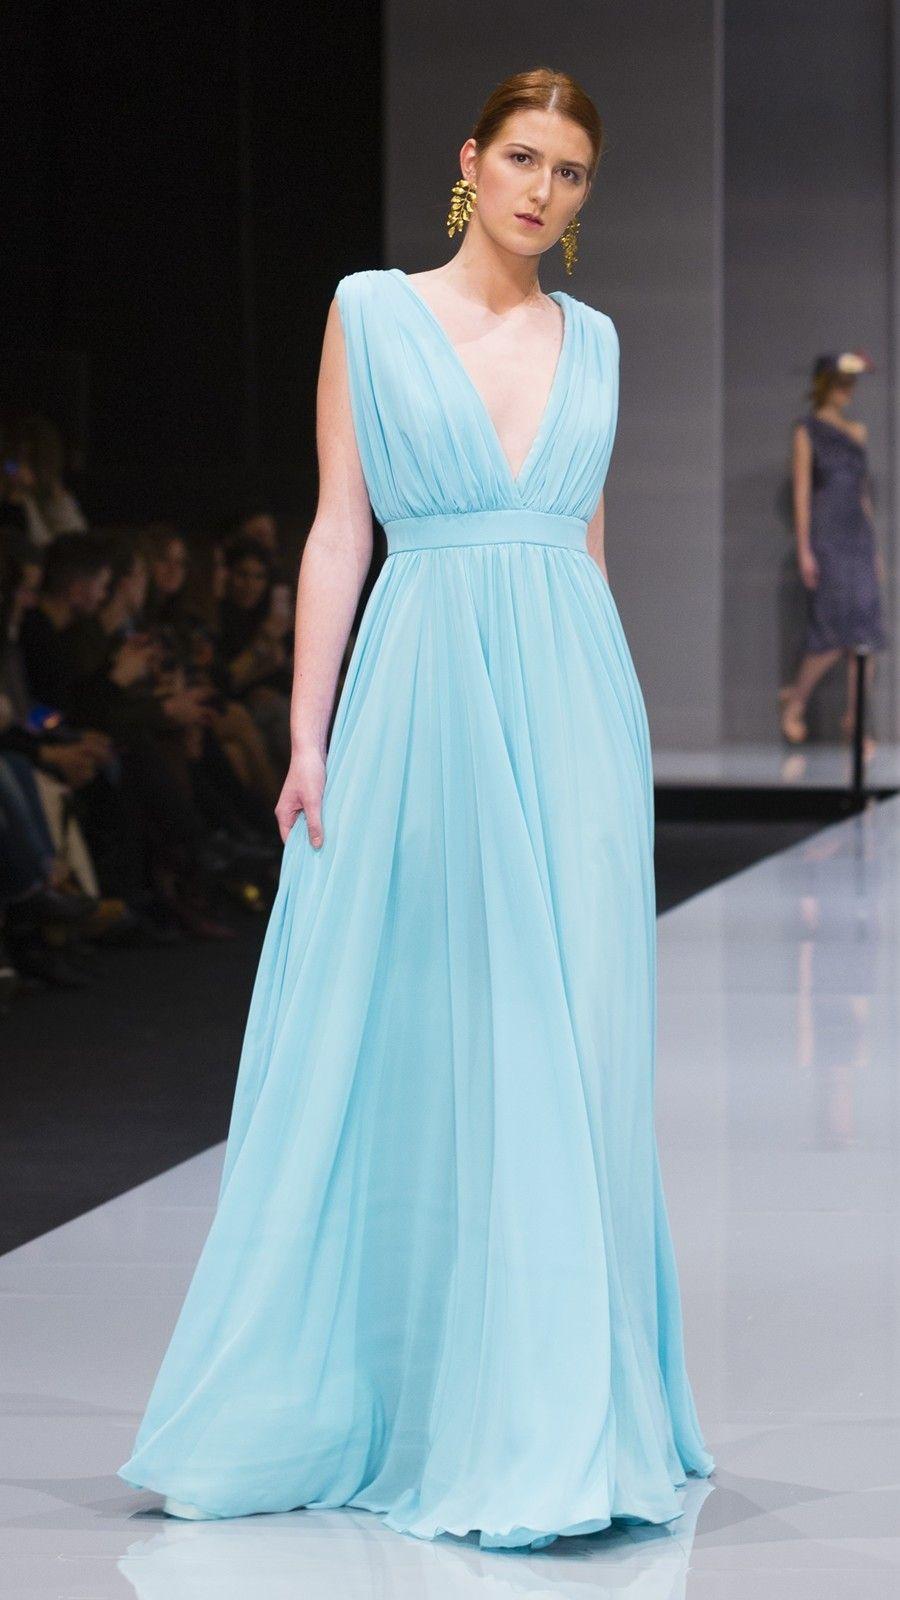 VESTIDO MABEL - Rocío Osorno - Diseñadora de moda - Sevilla   Outfit ...